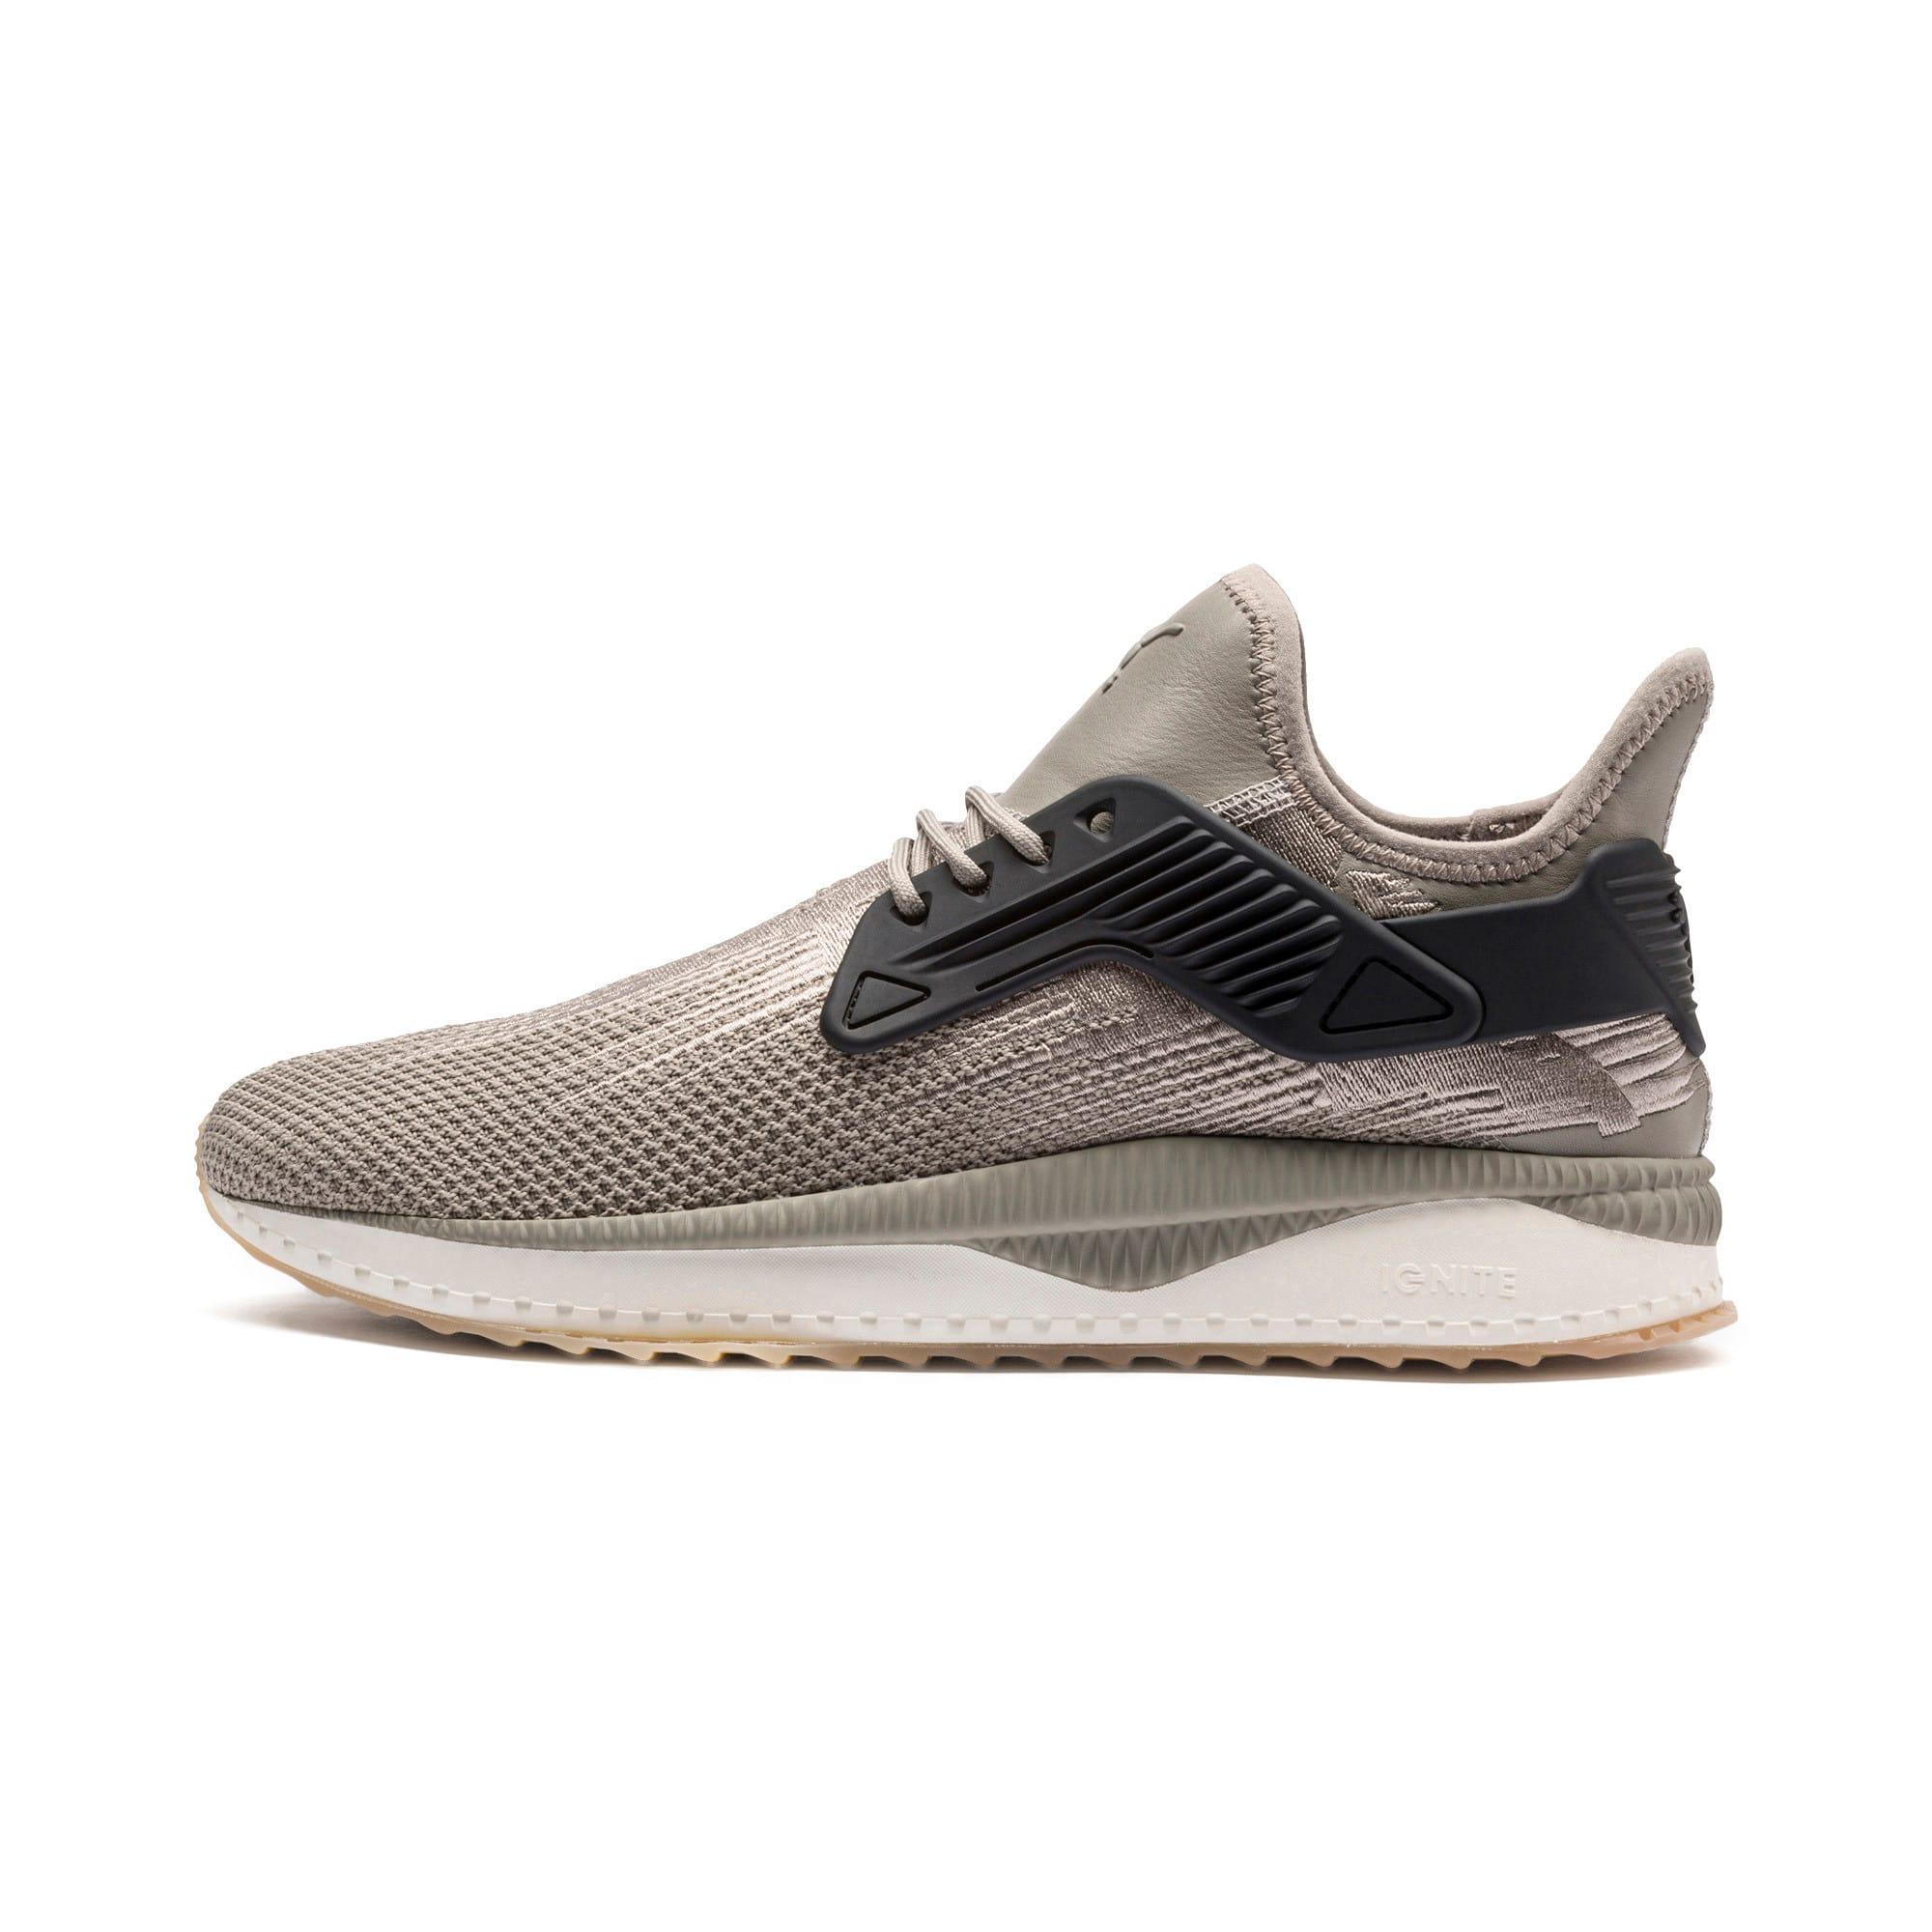 Thumbnail 1 of TSUGI Cage Premium Sneakers, Elephant Skin-Puma Black, medium